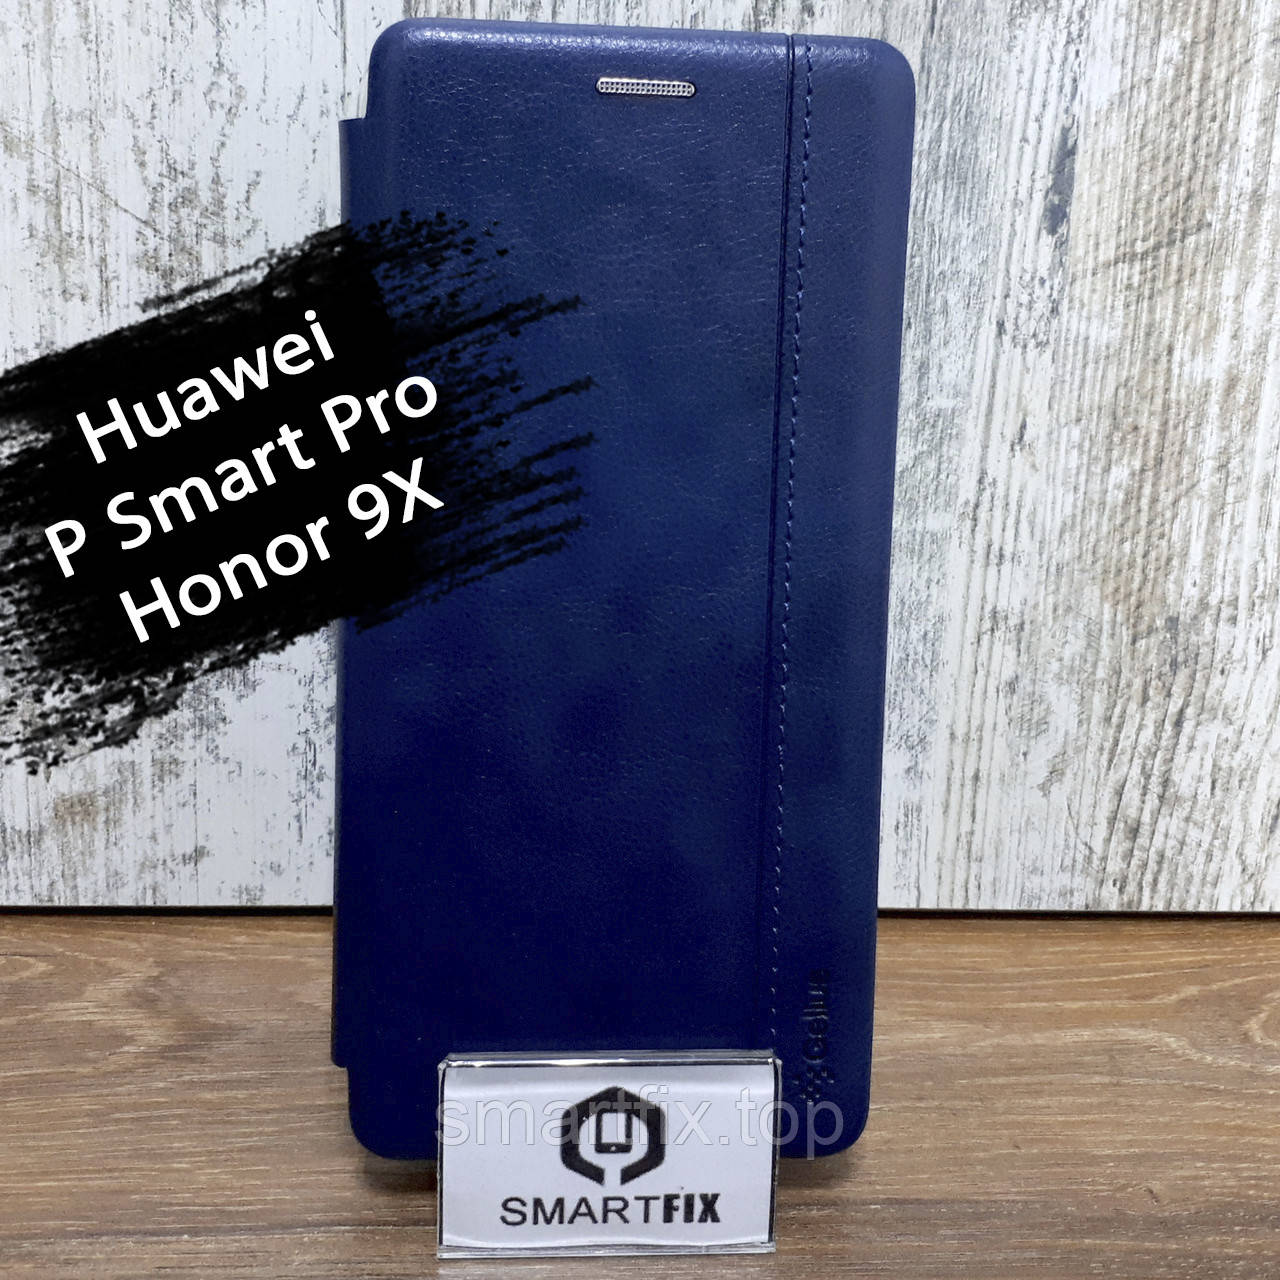 Чехол книжка для Huawei P Smart Pro / Honor 9X Gelius Синий